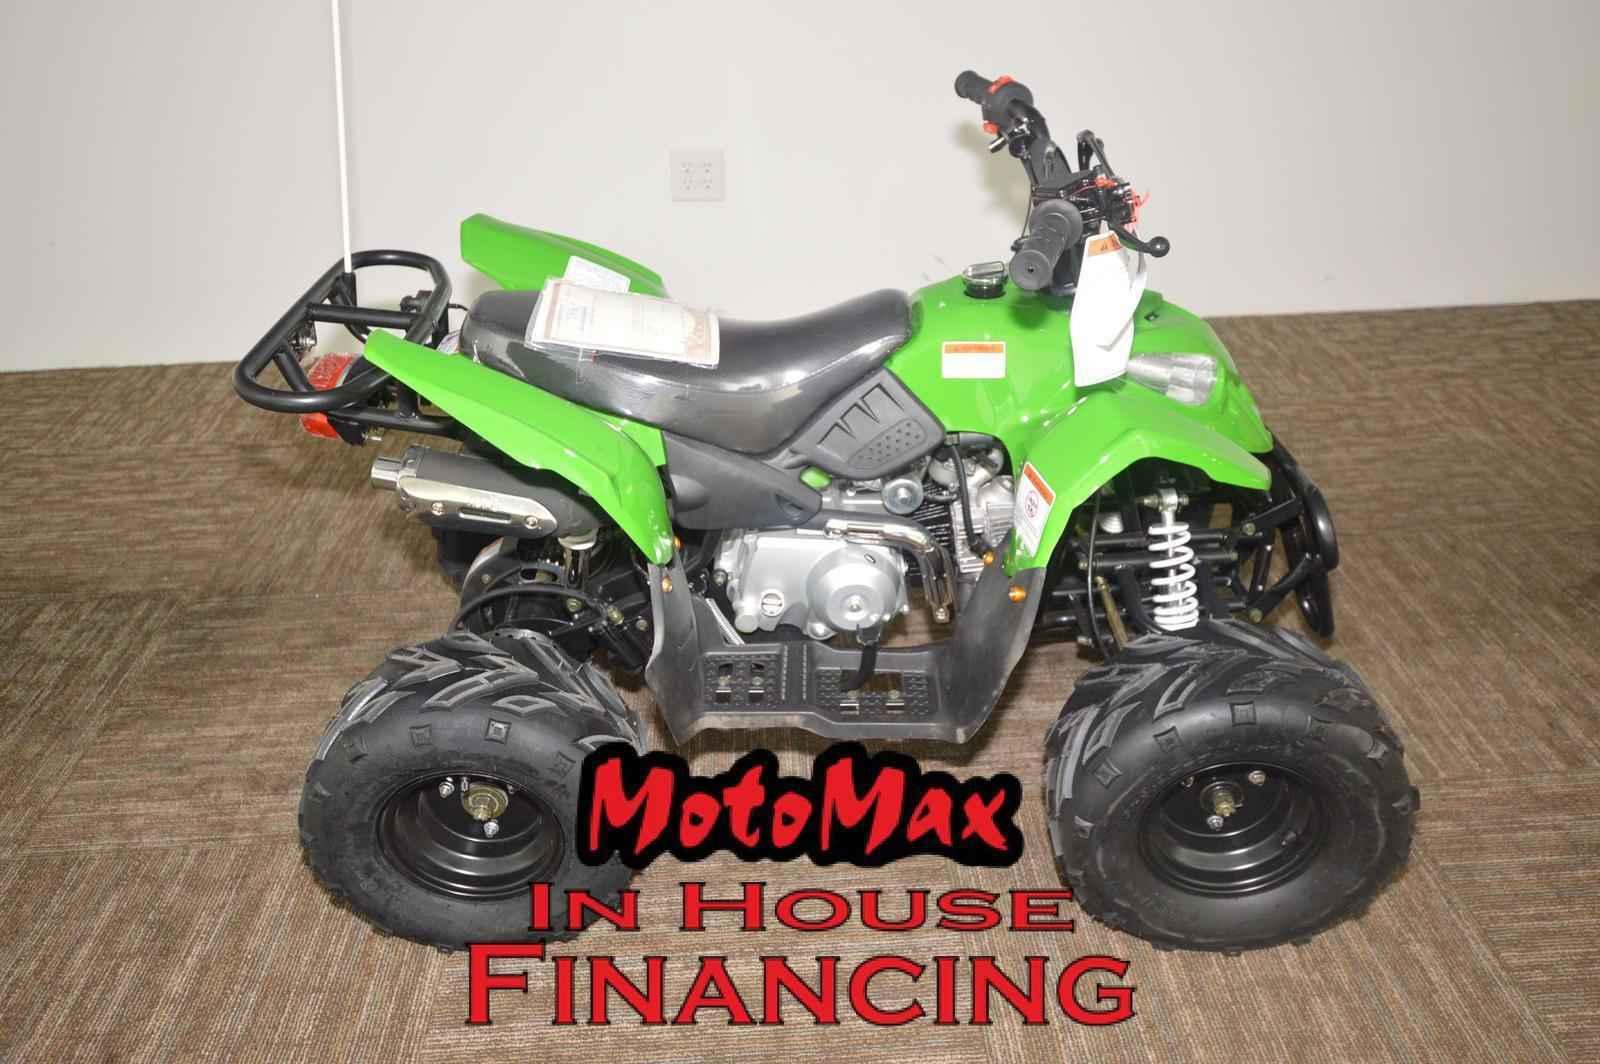 110cc Atv For Sale >> New 2015 Wildcat 110cc Atvs For Sale In North Carolina On Atvtrades Com